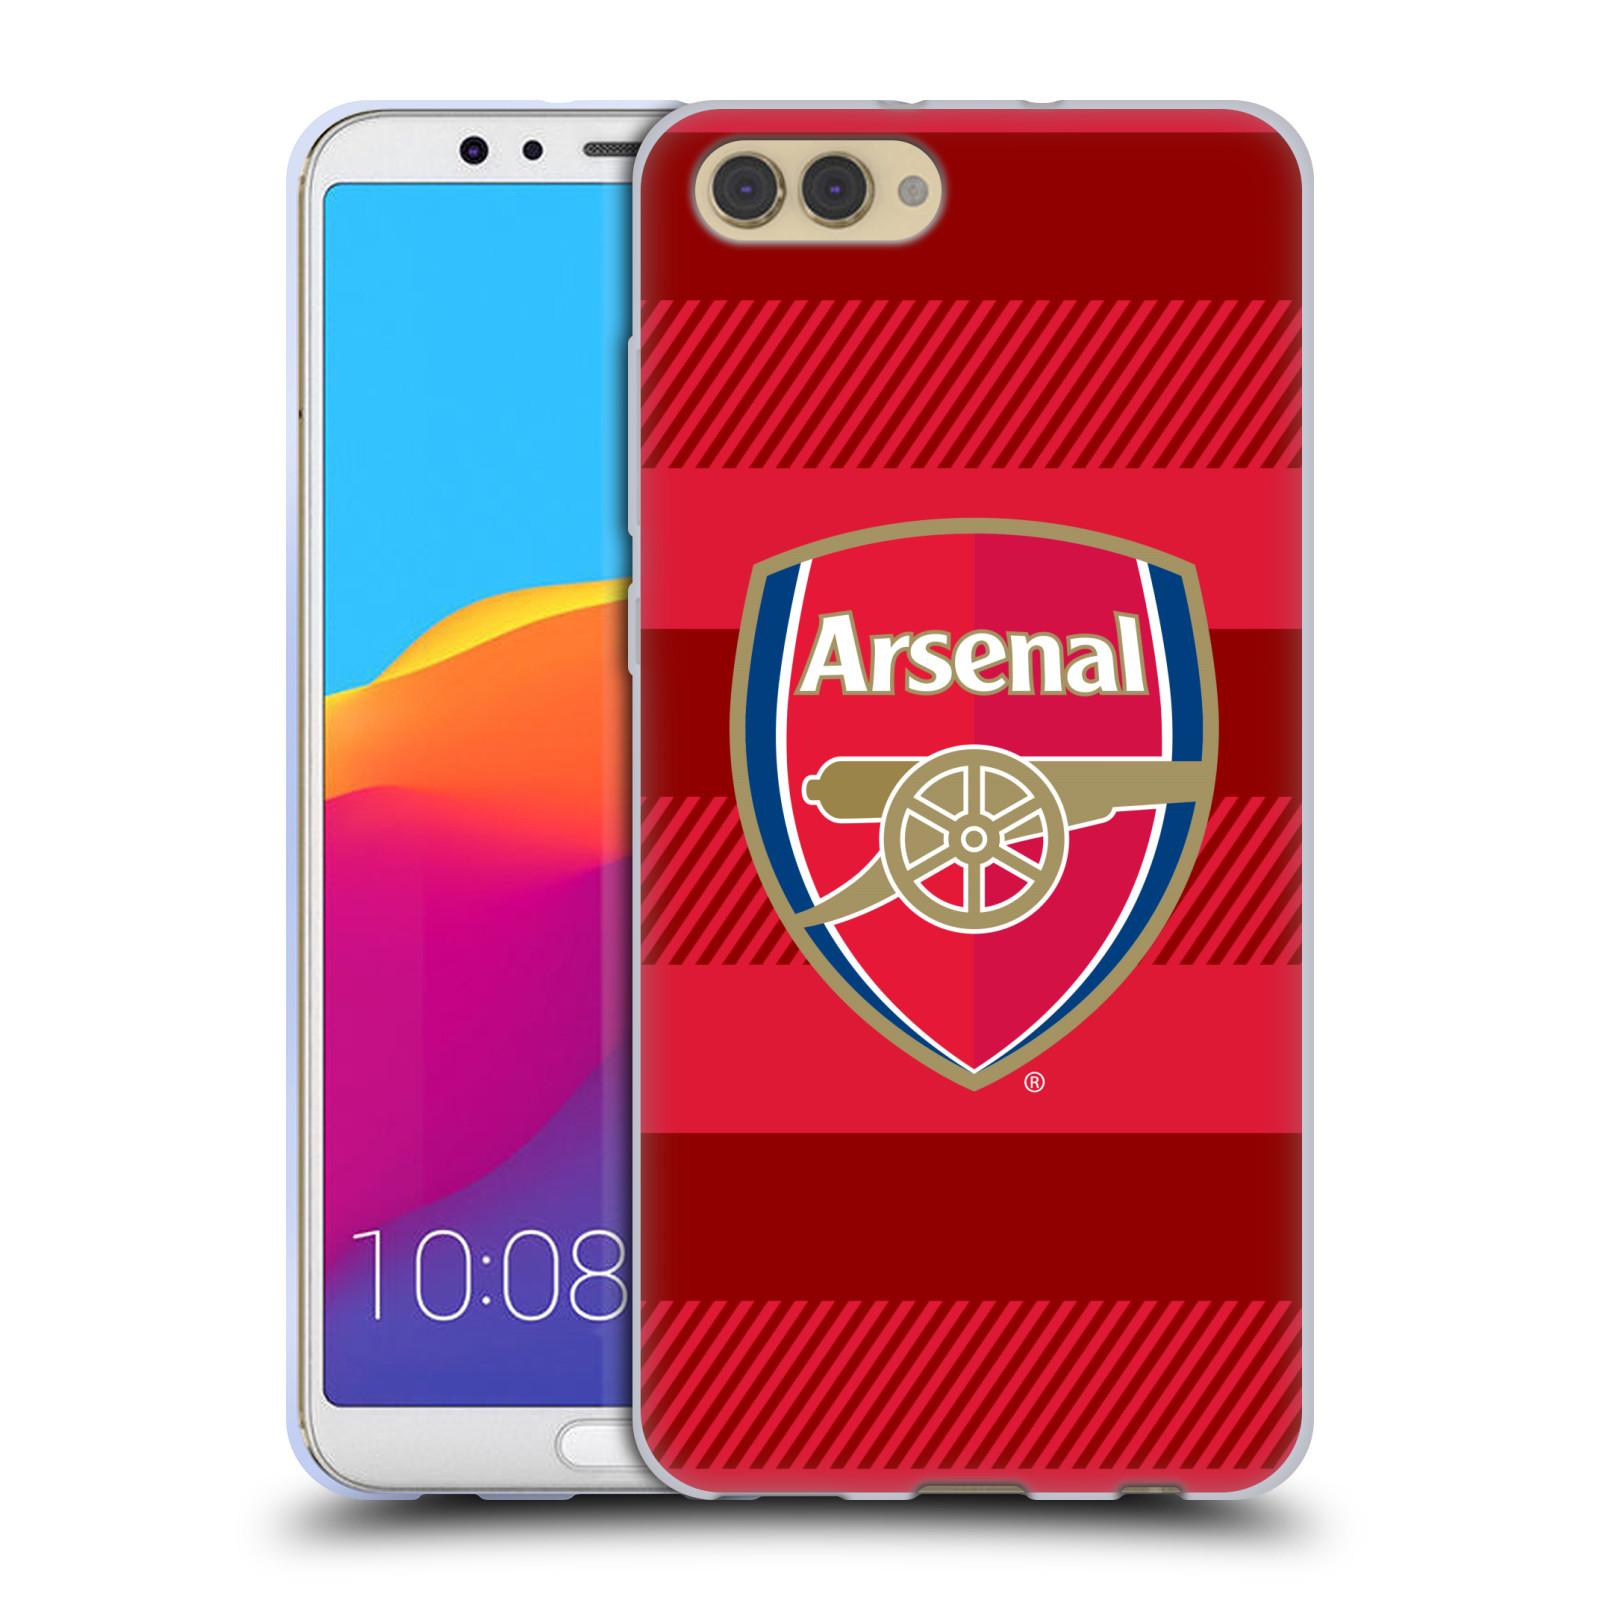 Silikonové pouzdro na mobil Honor View 10 - Head Case - Arsenal FC - Logo s pruhy